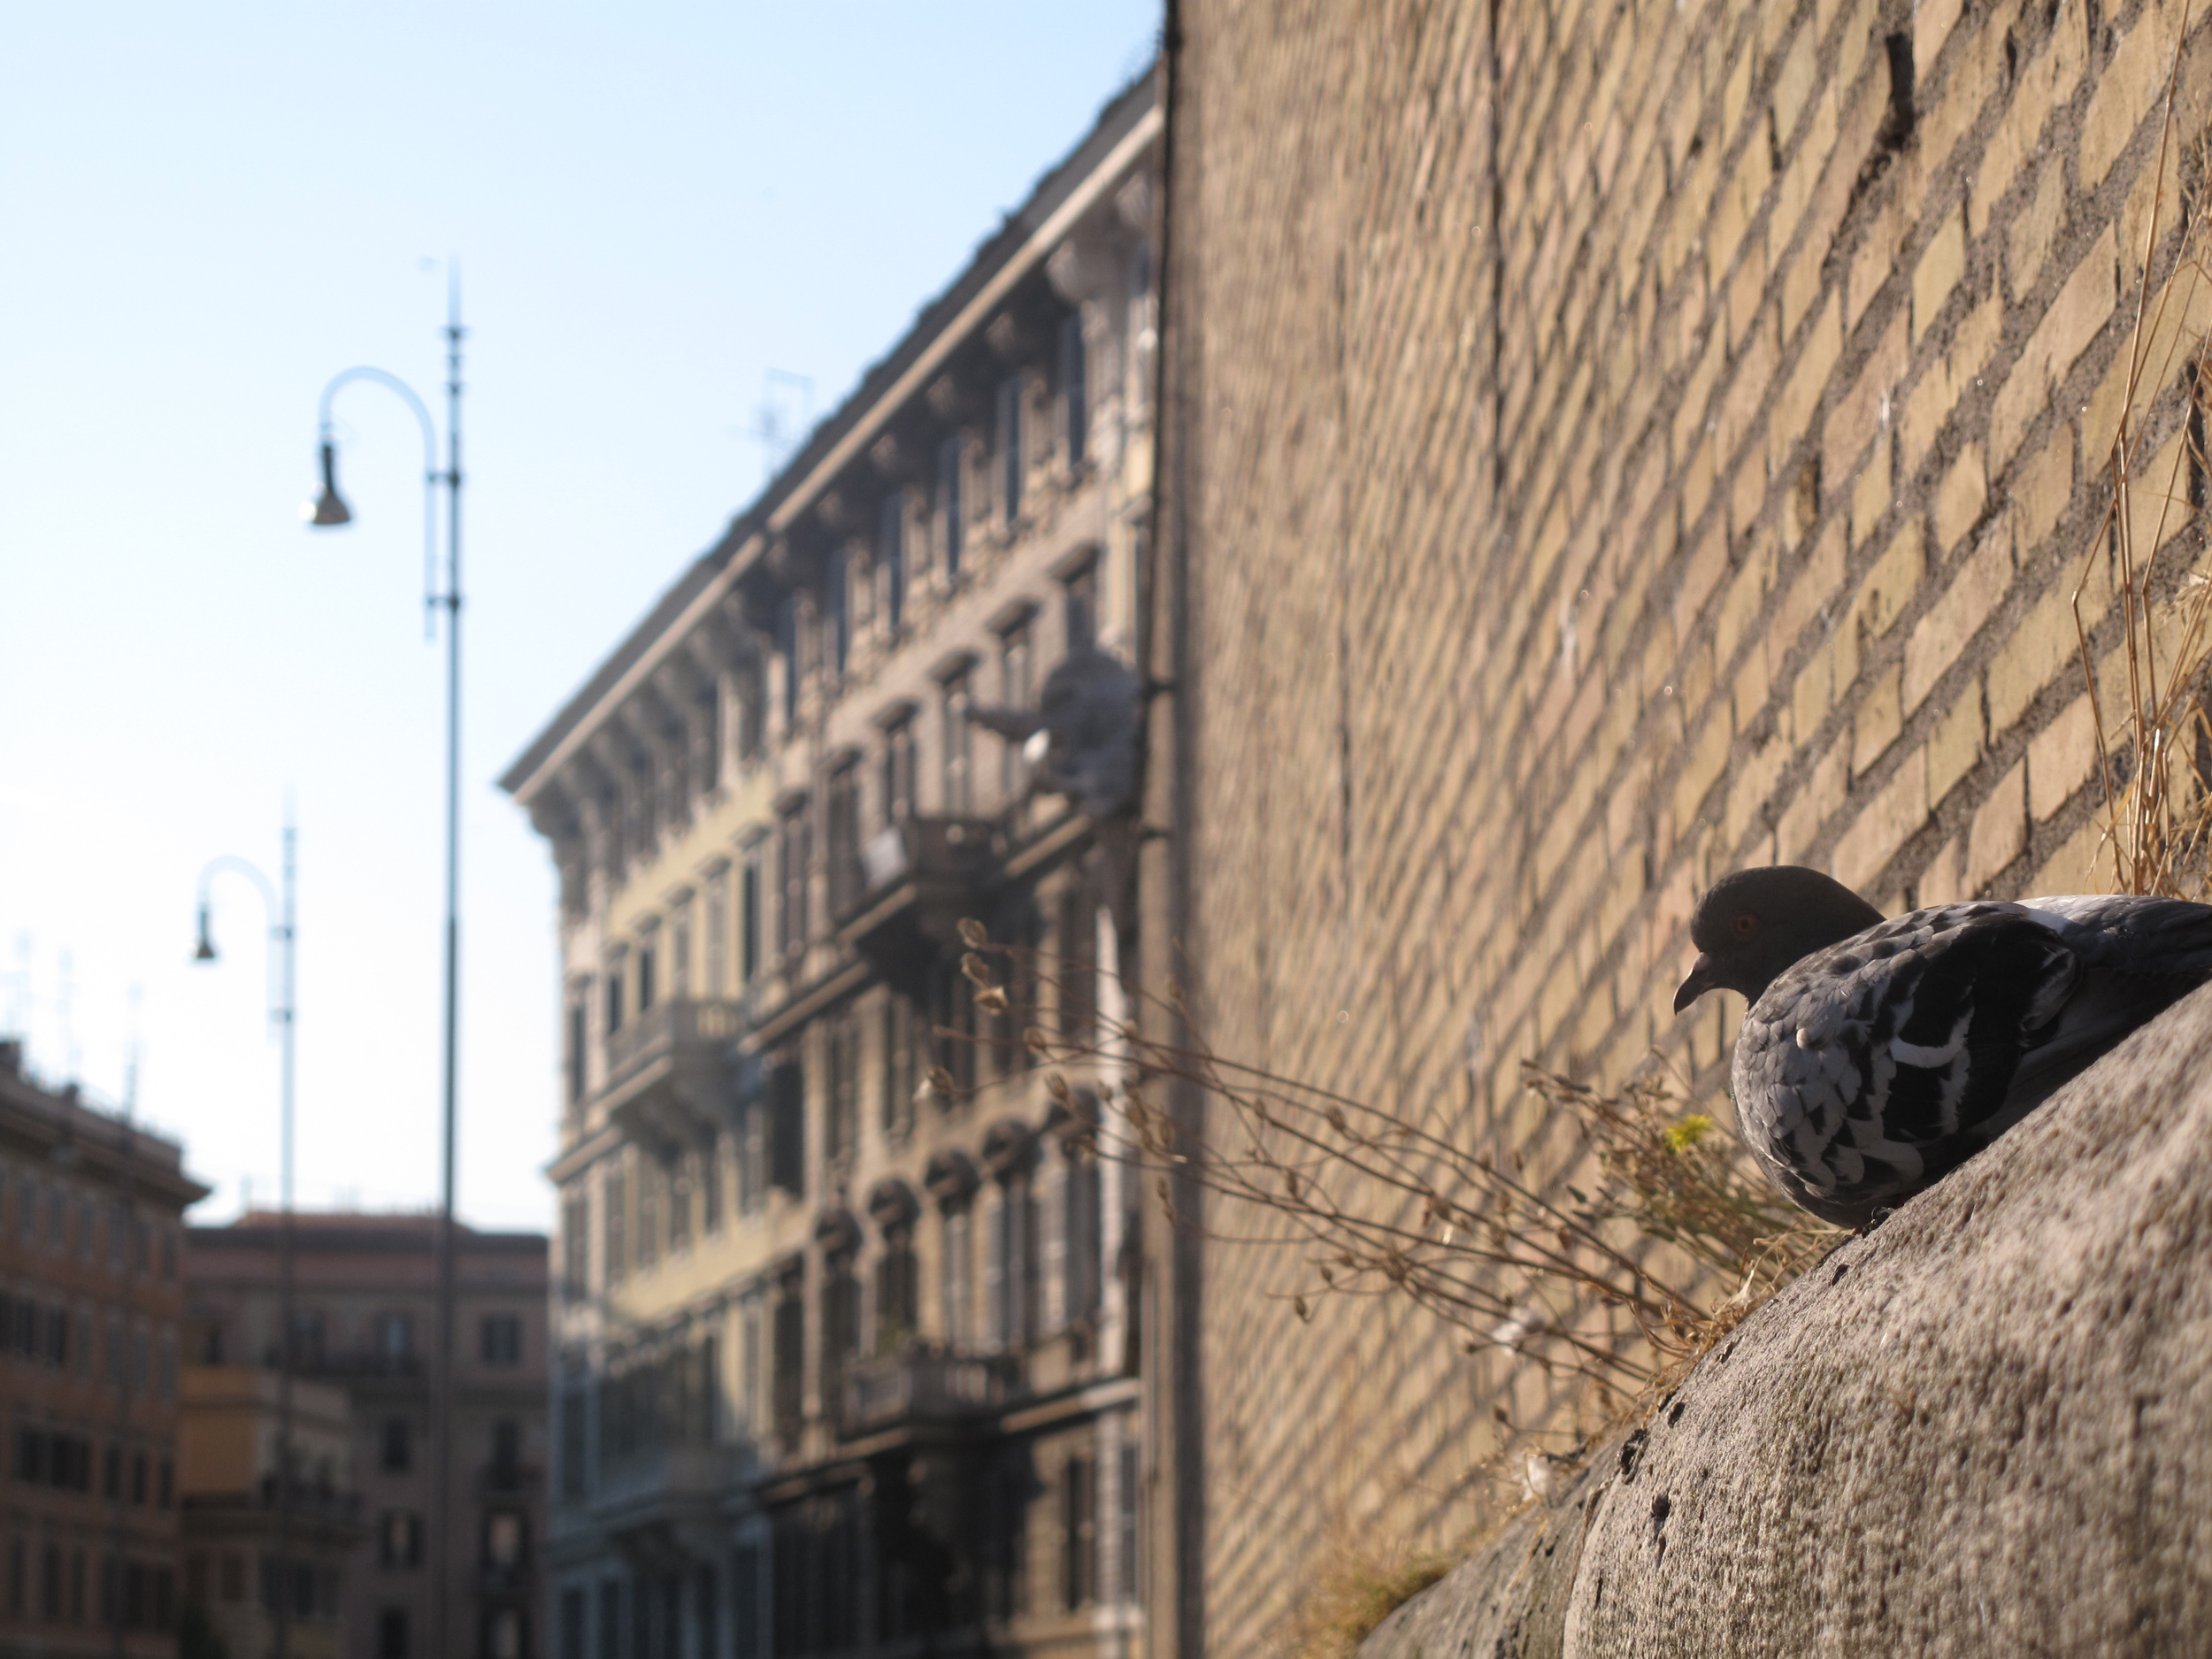 Pigeon near the Vatican walls, Rome